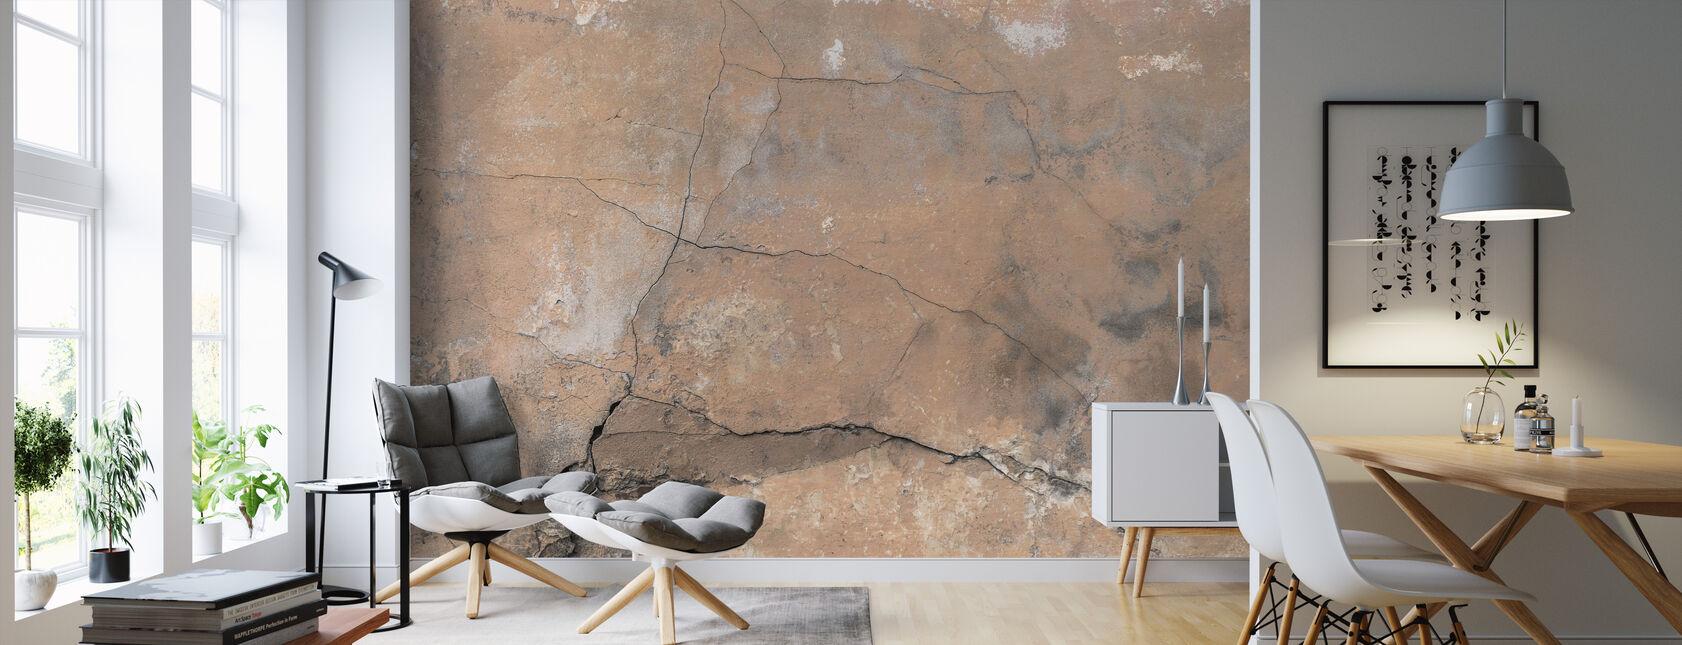 Sprukket steinmur - Tapet - Stue